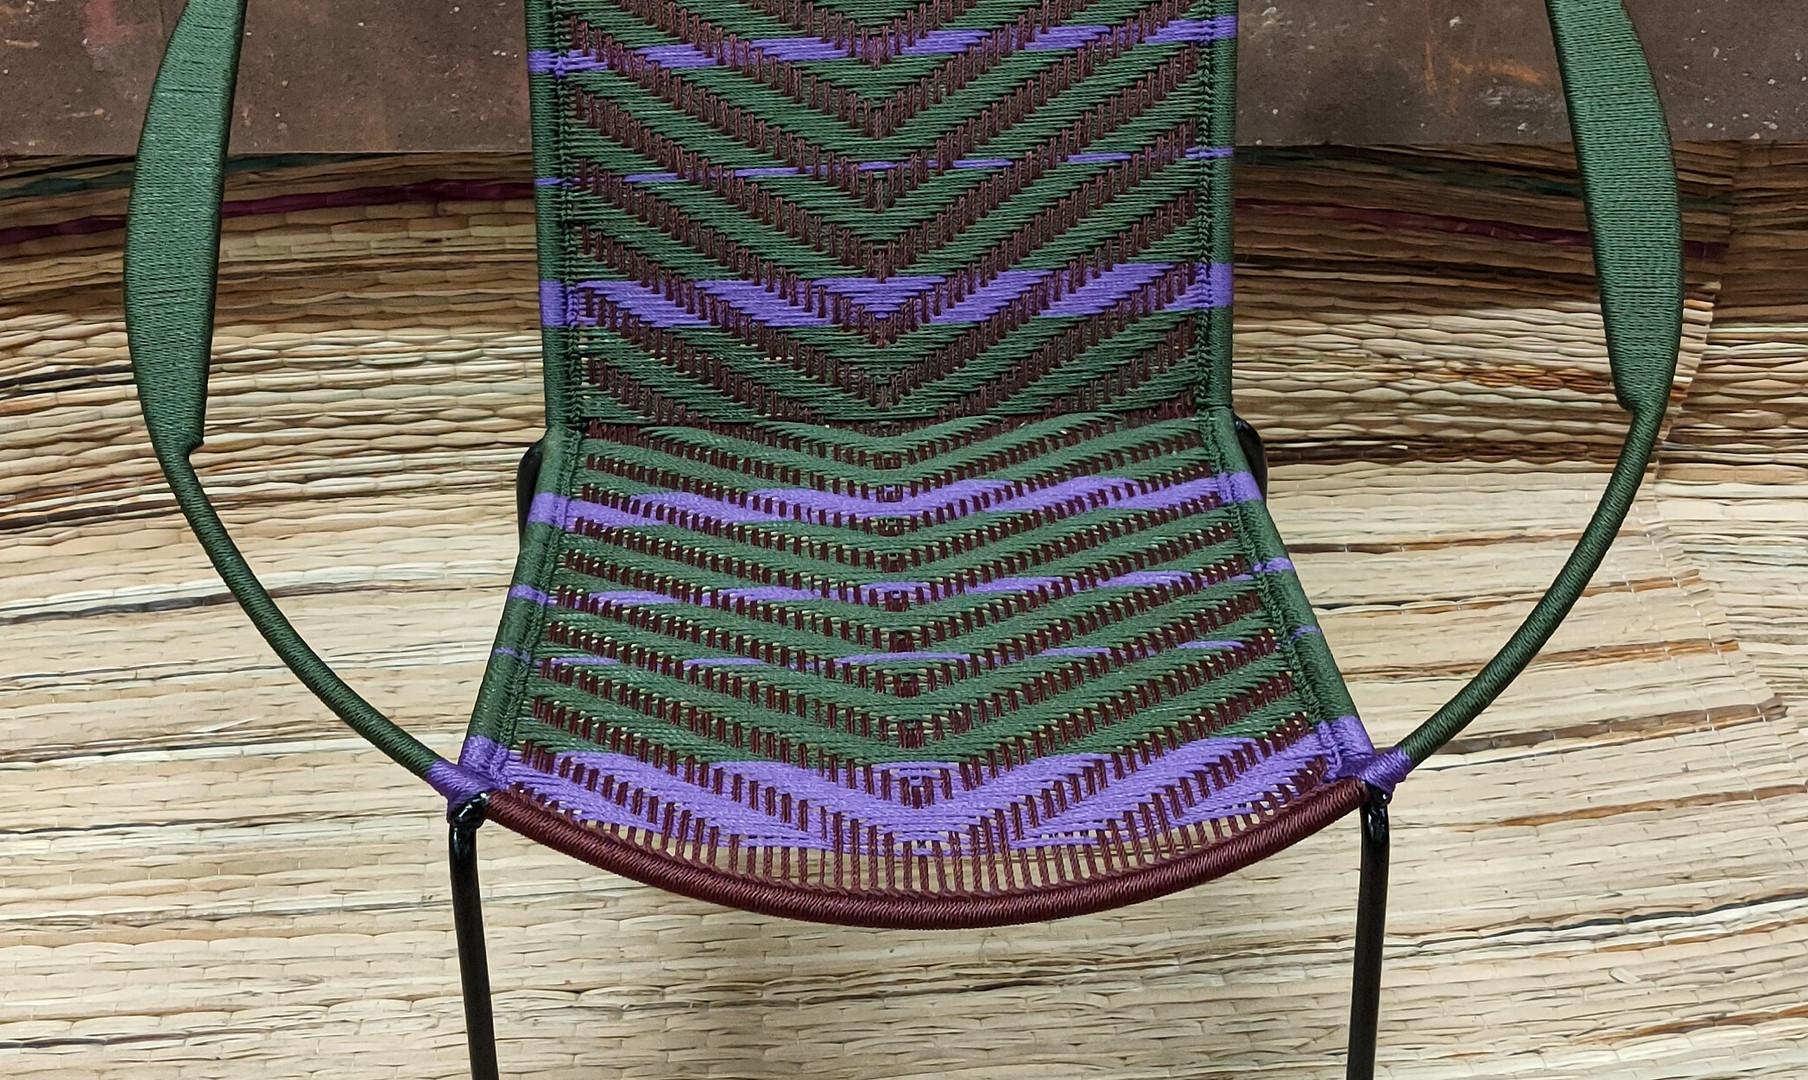 Kaki / marron / bandes violet